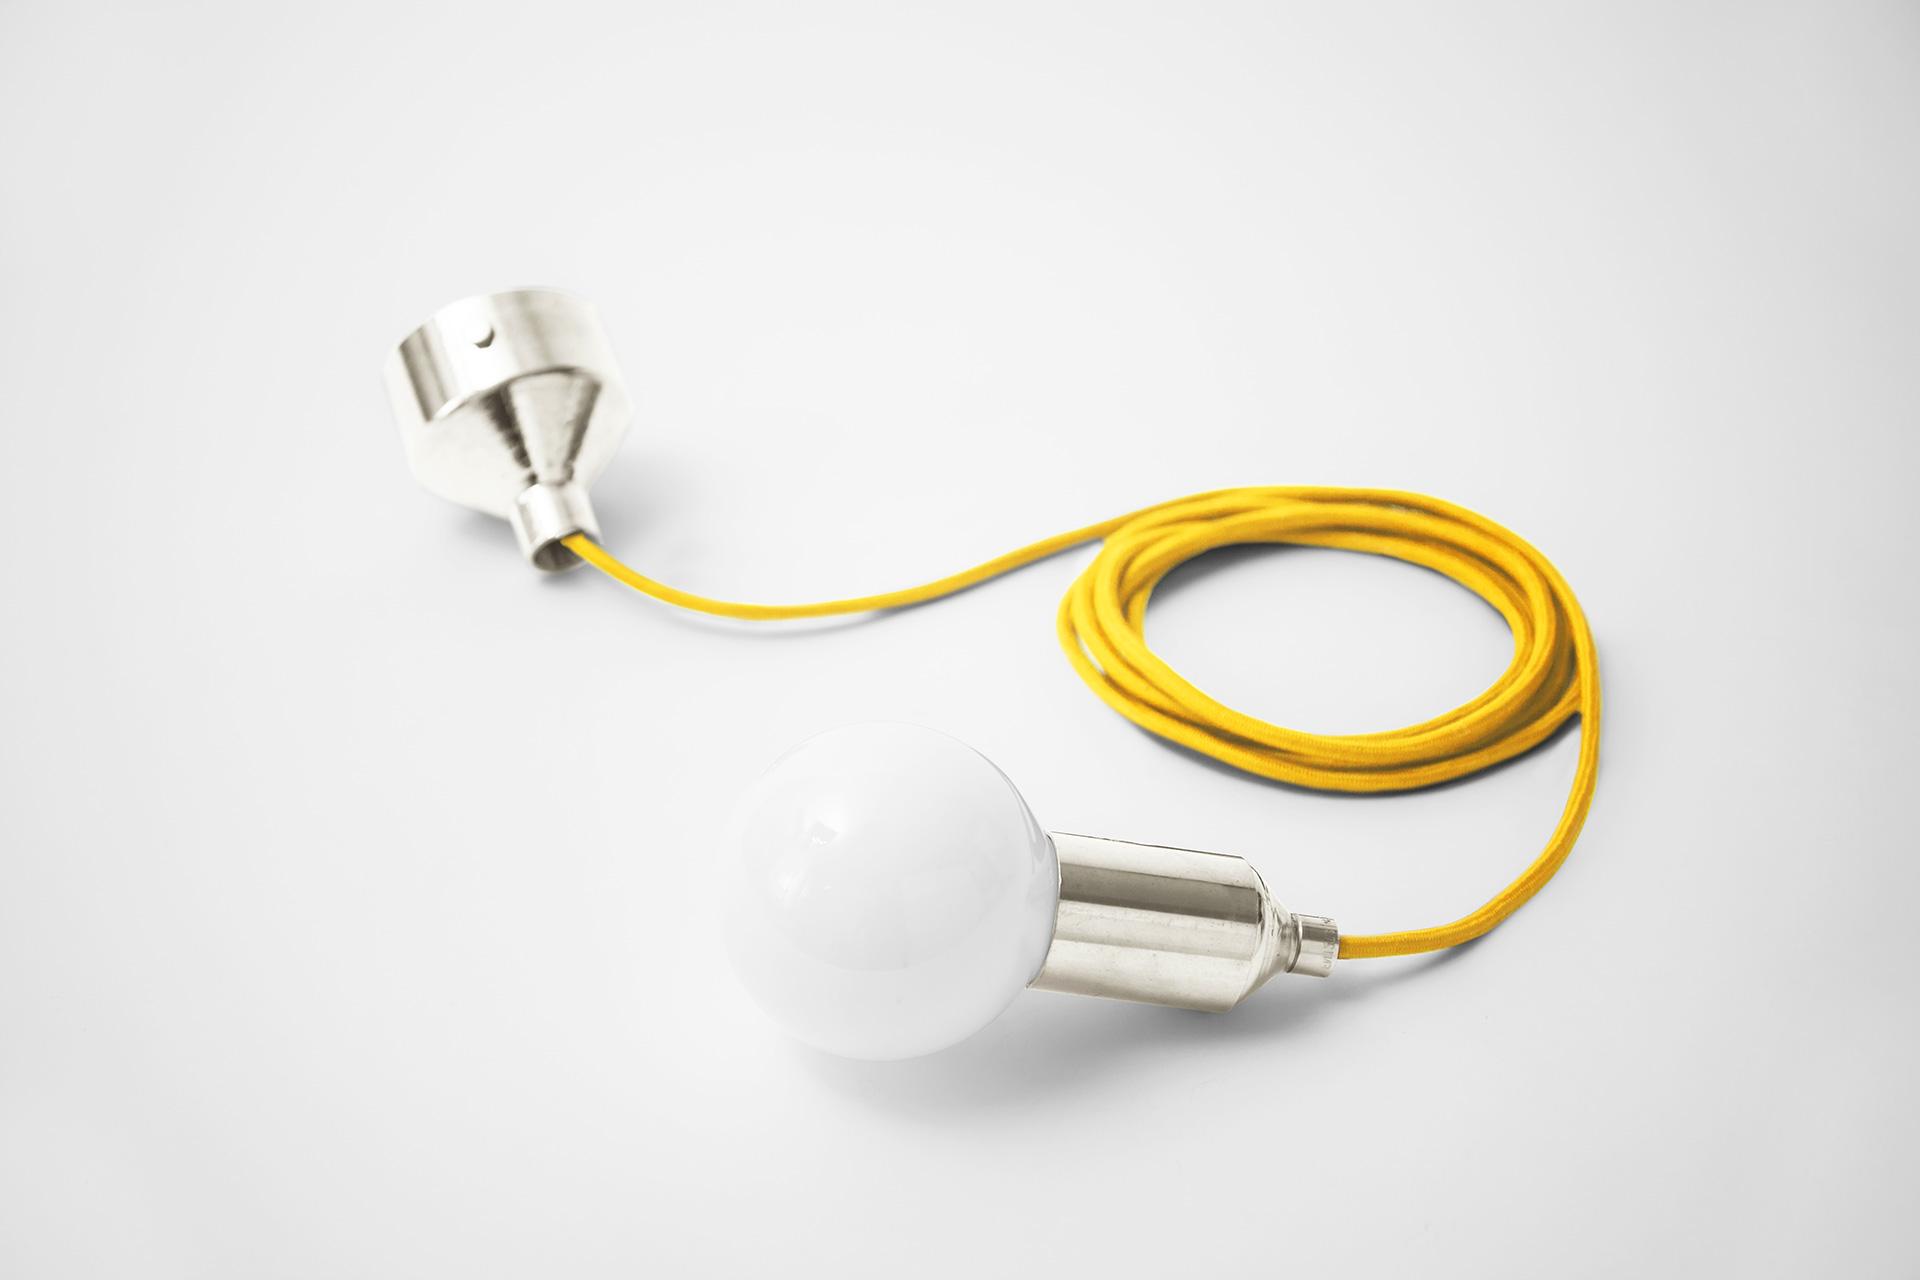 Joyful and fun single pendant light in silver nickel metal finish and with fruit yellow braided cord